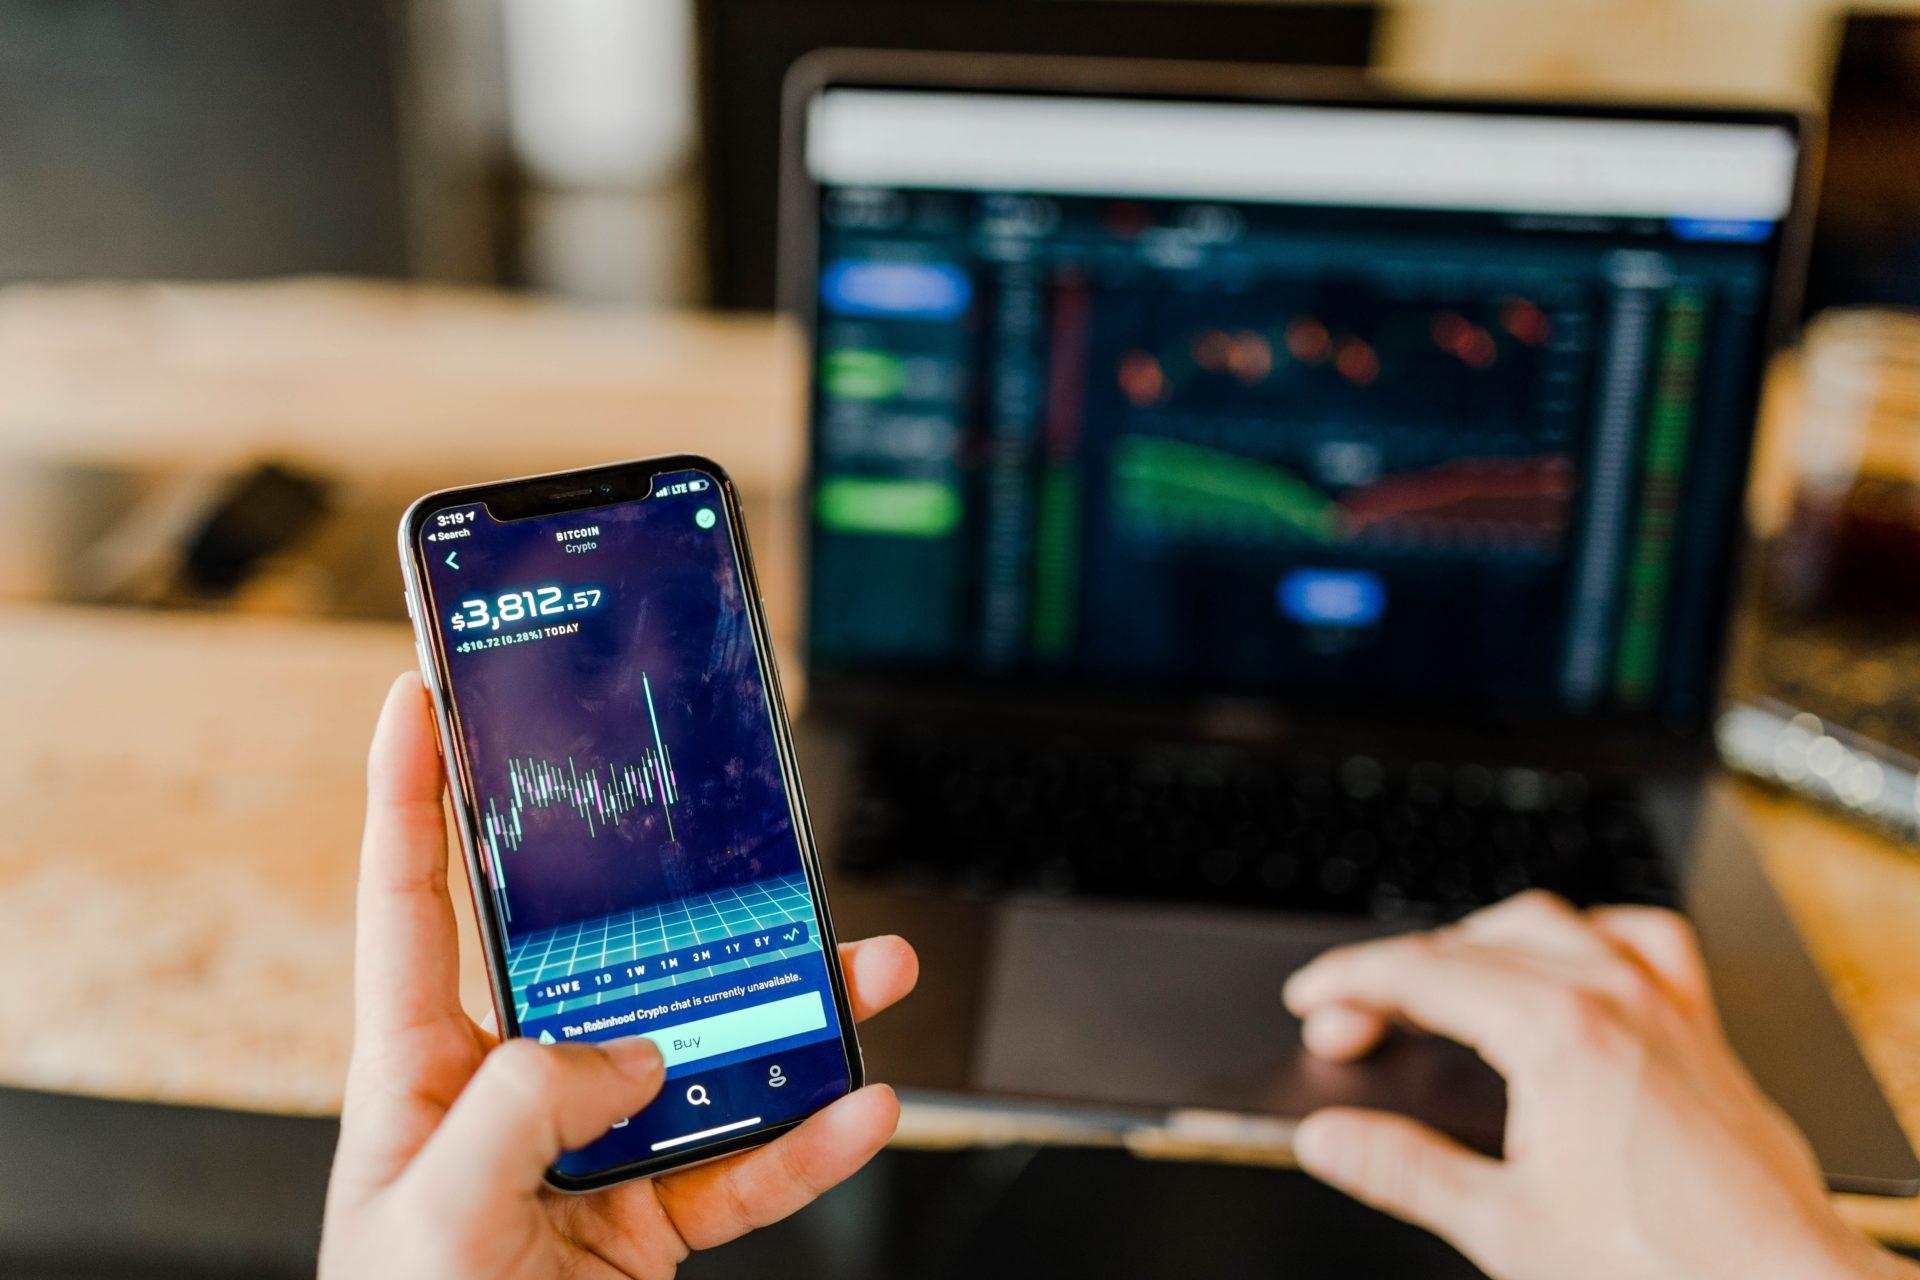 """Beli Bitcoin,"" Miliarder VC Lain Memberitahu Investor Yang Ingin Melarikan Diri Dari Deflasi Besar-besaran"